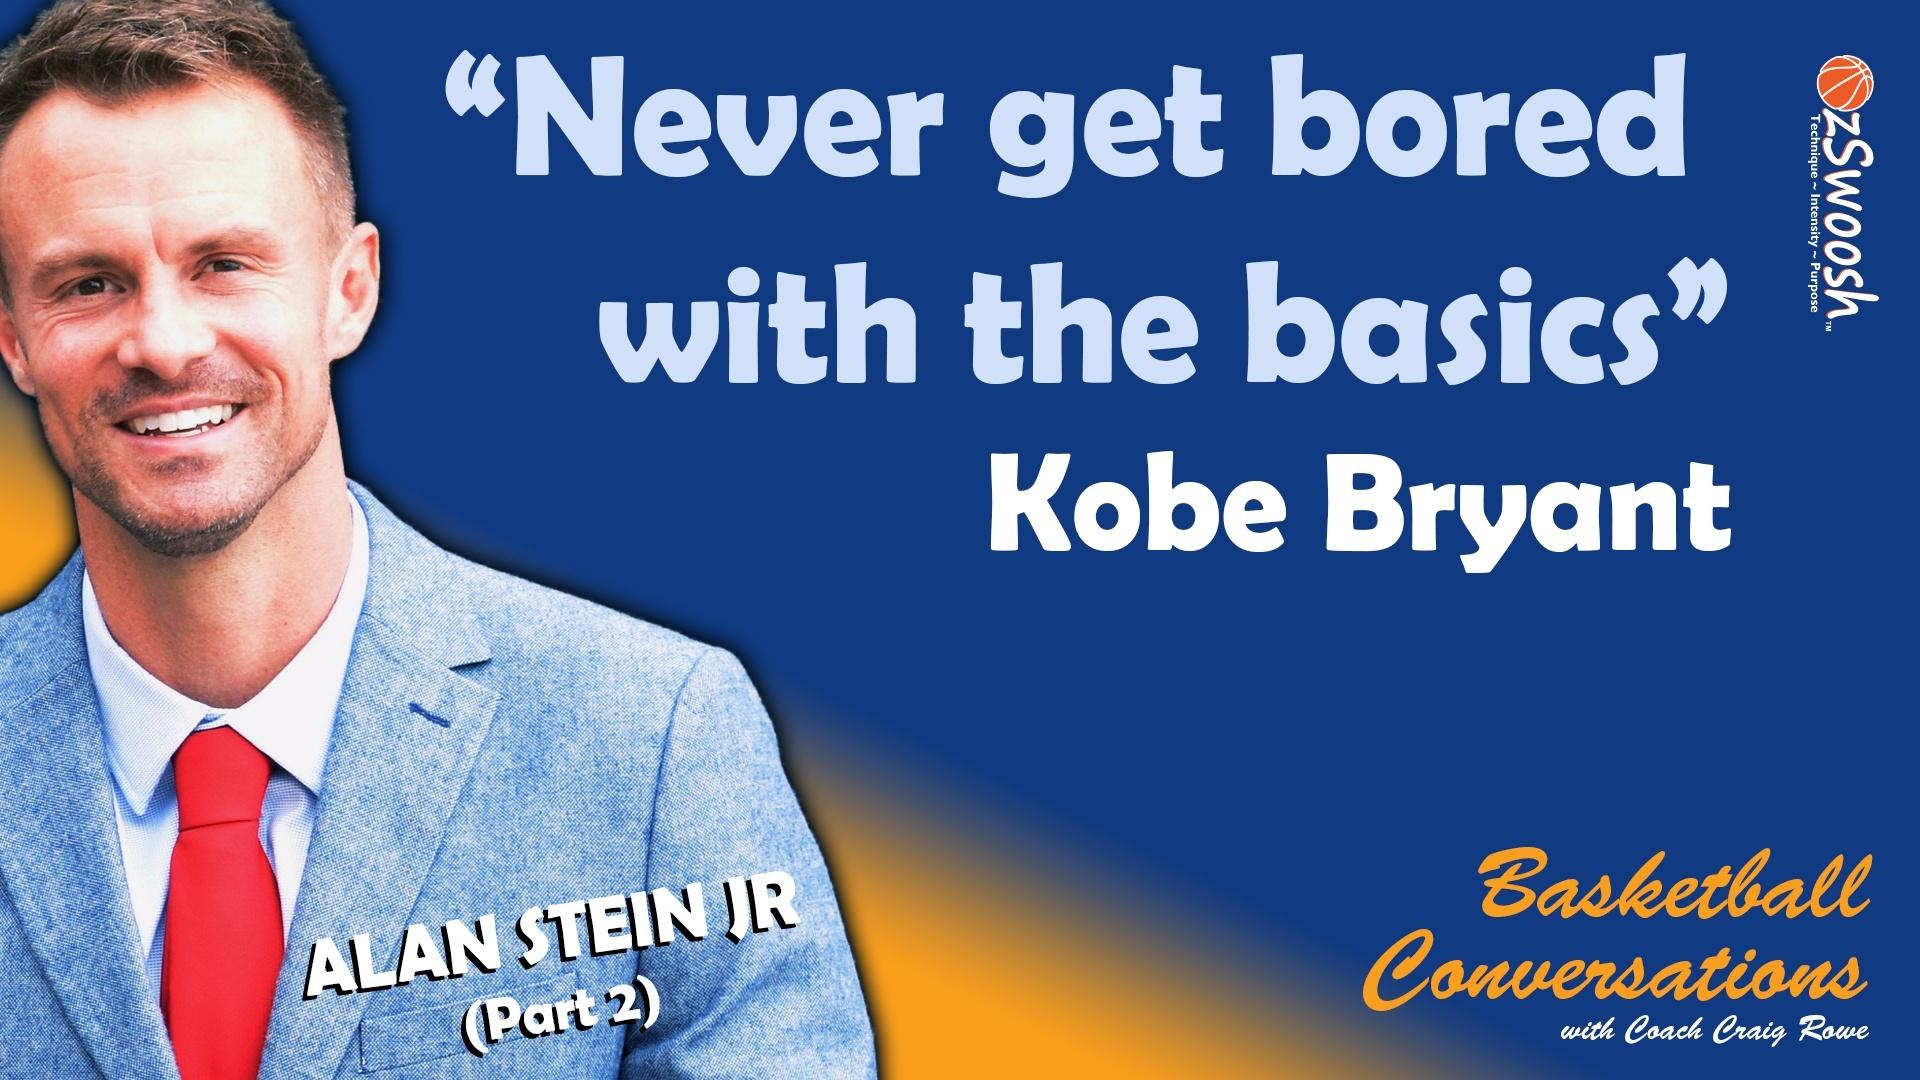 Kobe Bryant said, Never get bored with the basics - Alan Stein Jr